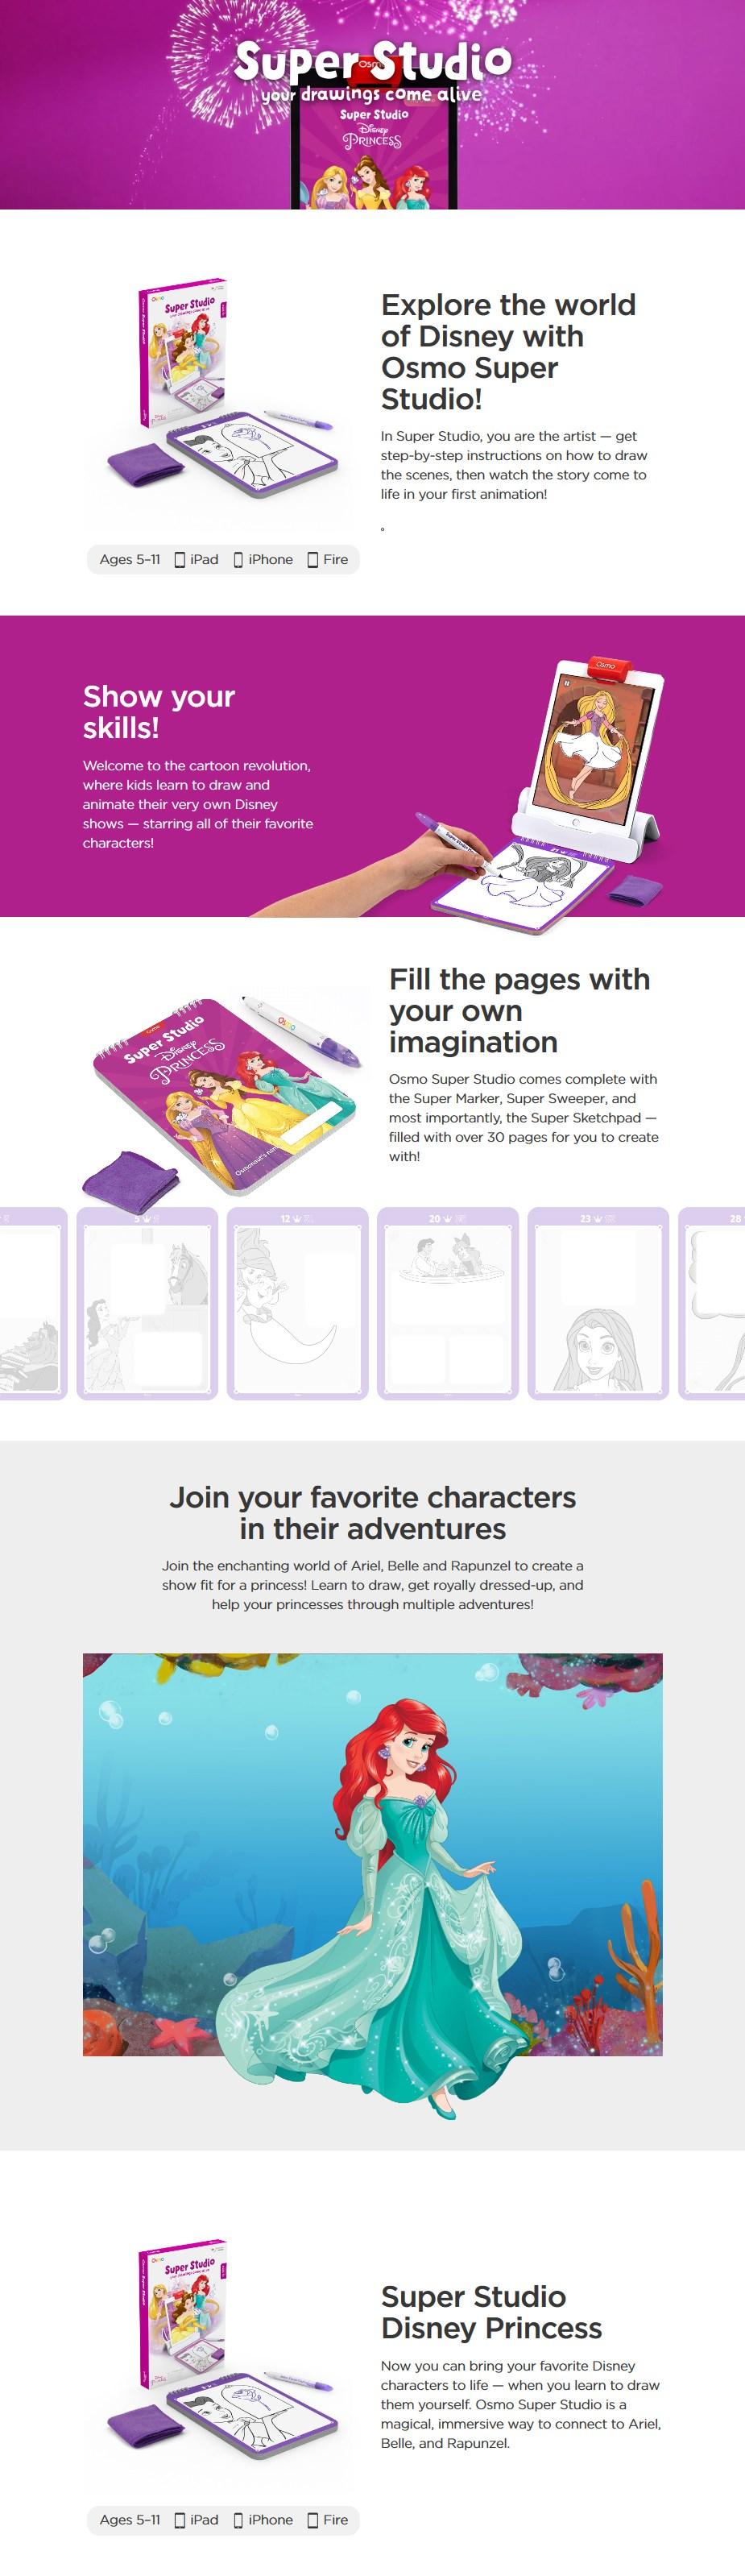 Osmo Super Studio - Disney Princess for iPad - Desktop Overview 1